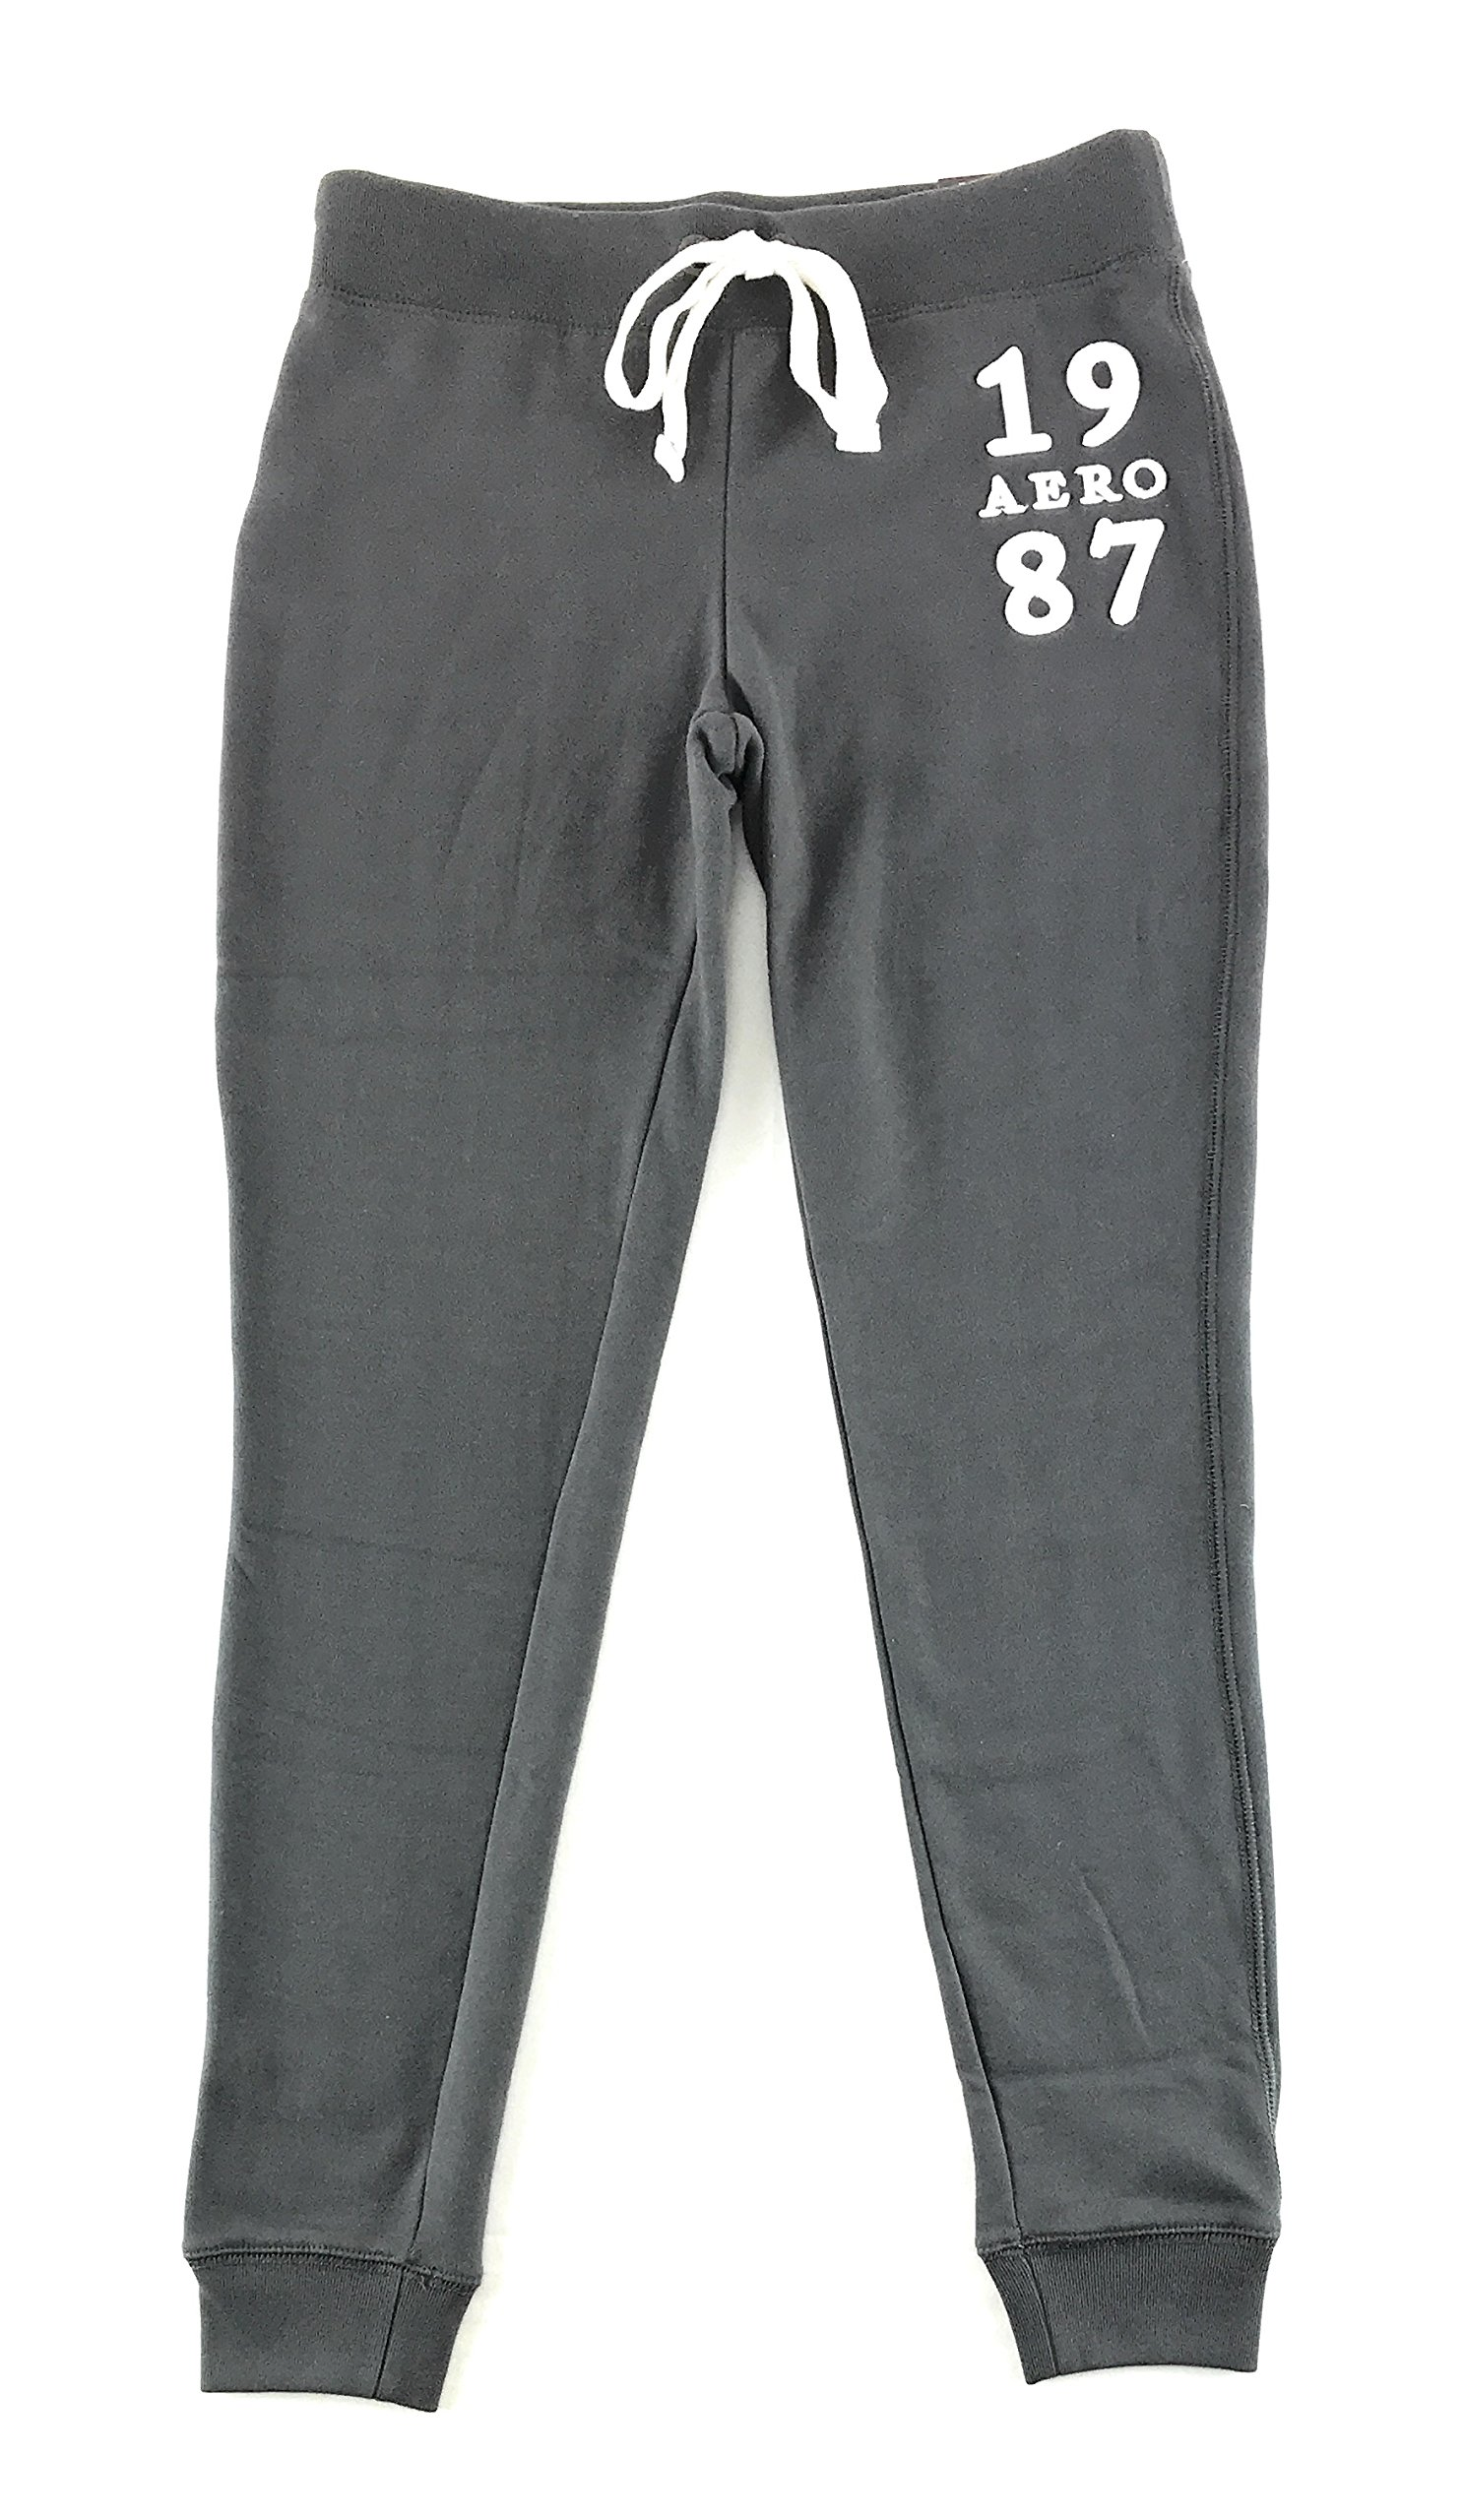 Aeropostale Womens Aero New York Jogger Sweatpants Dark Gray Large